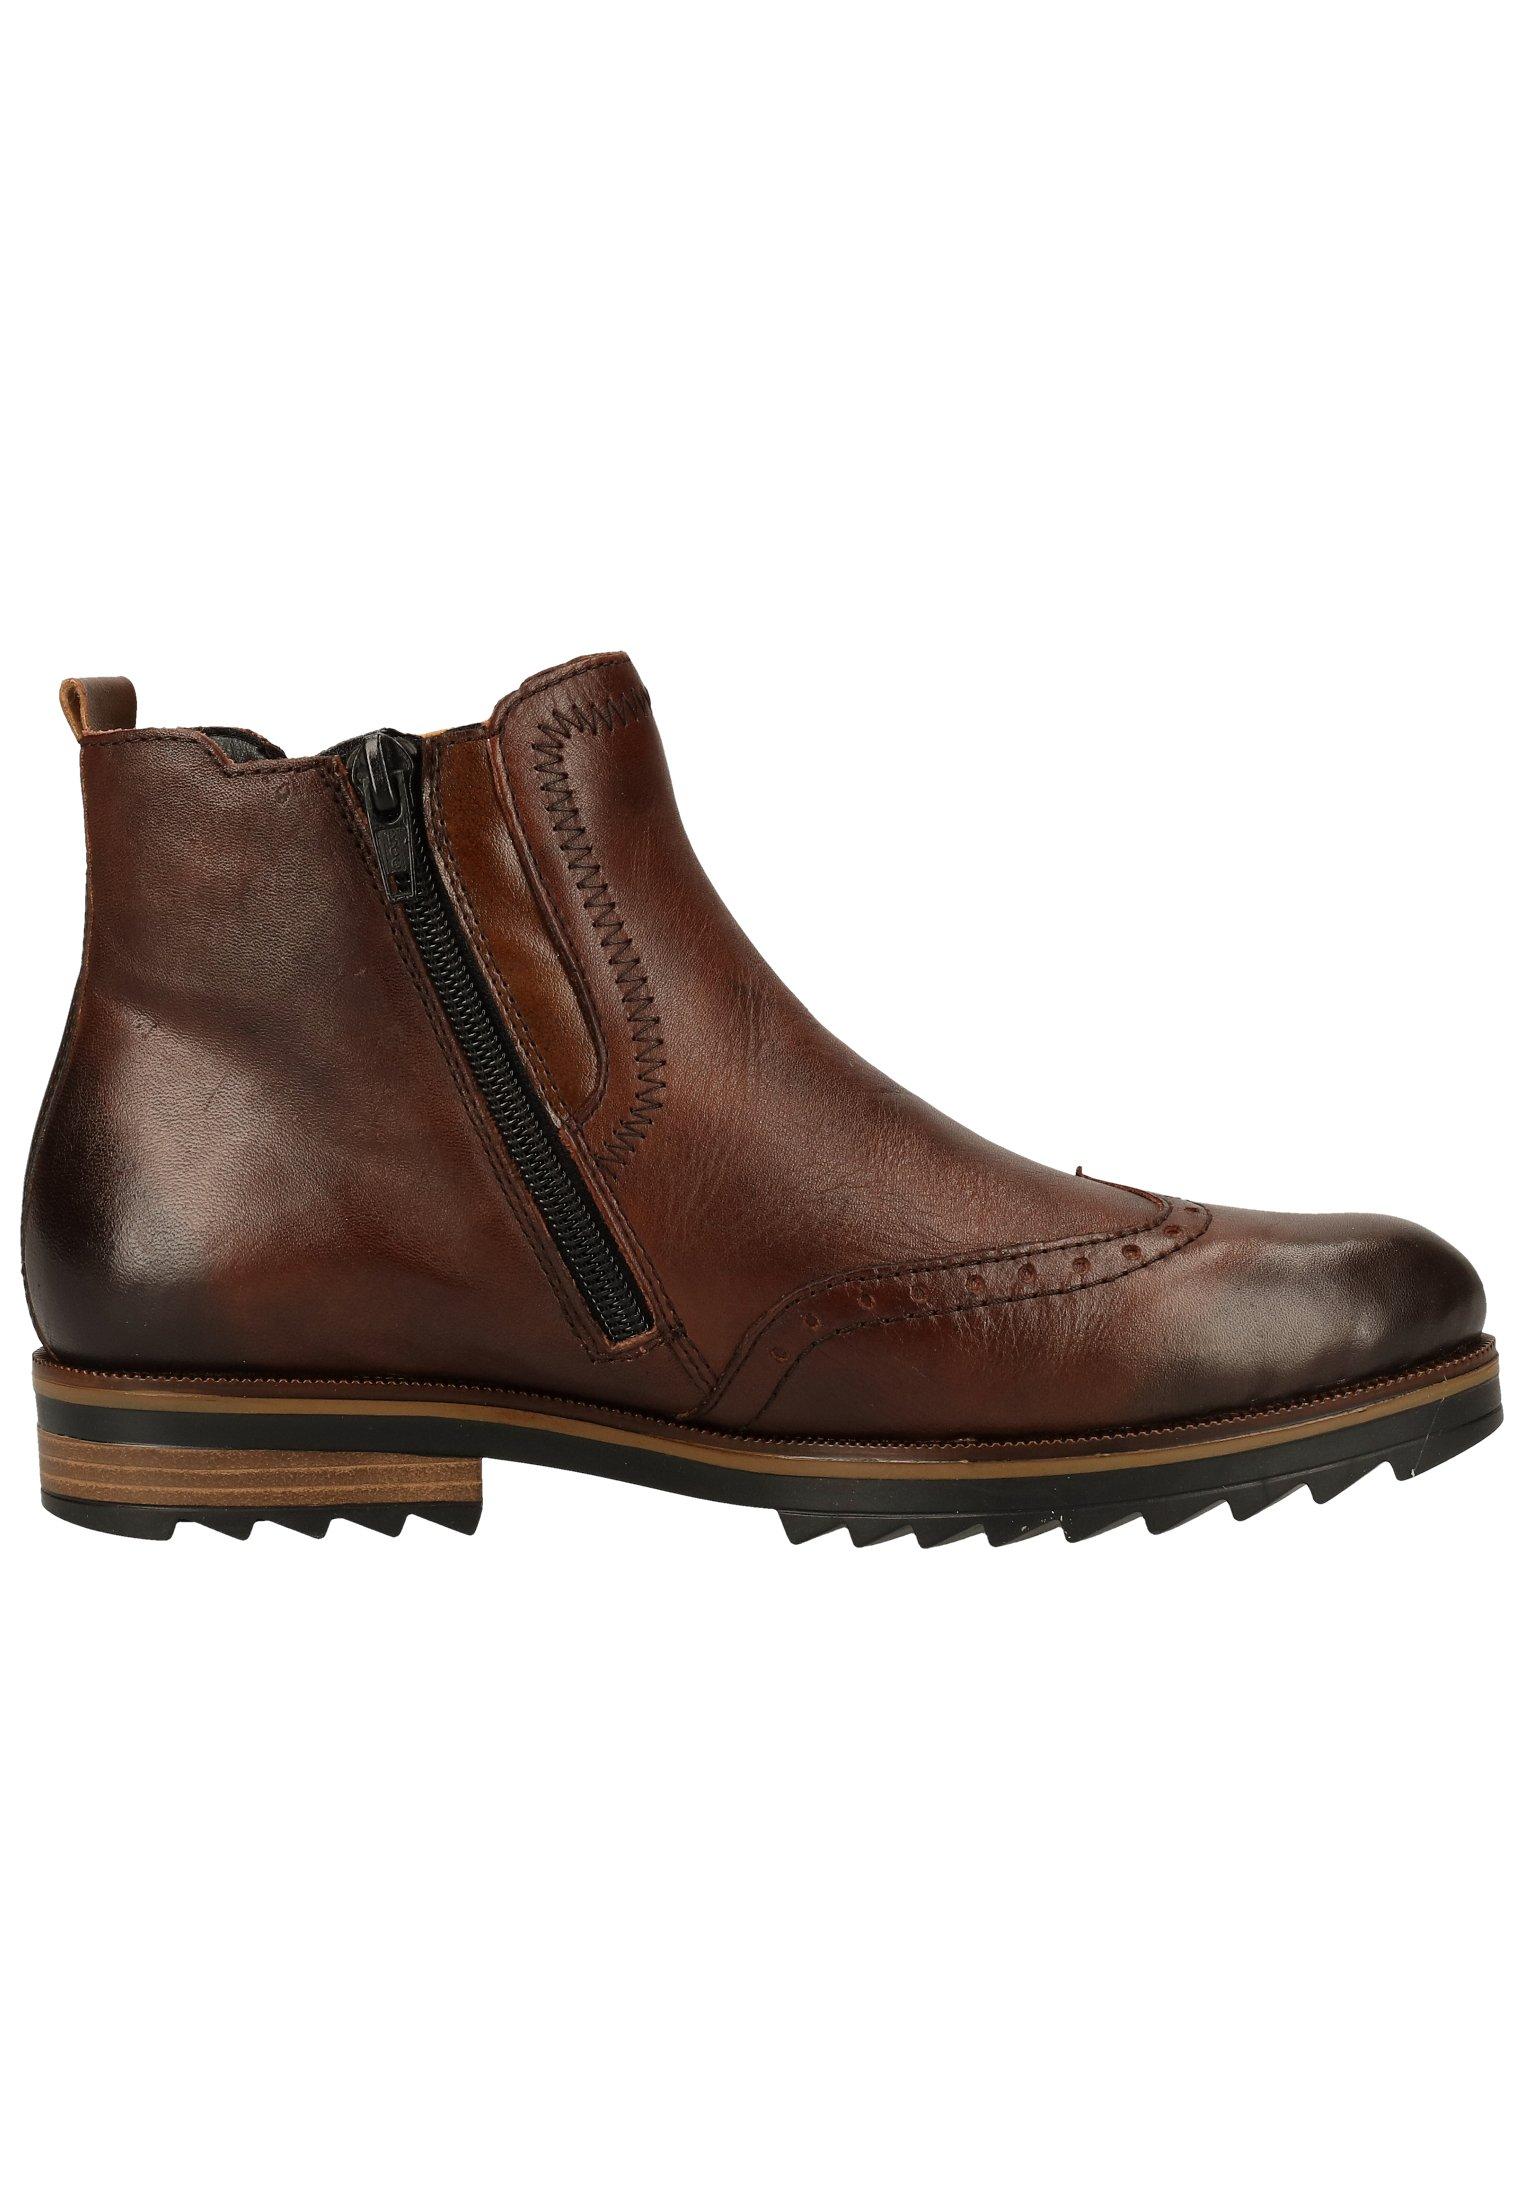 Remonte Boots à talons - mokka/mustard/25 - Bottines Femme Limité